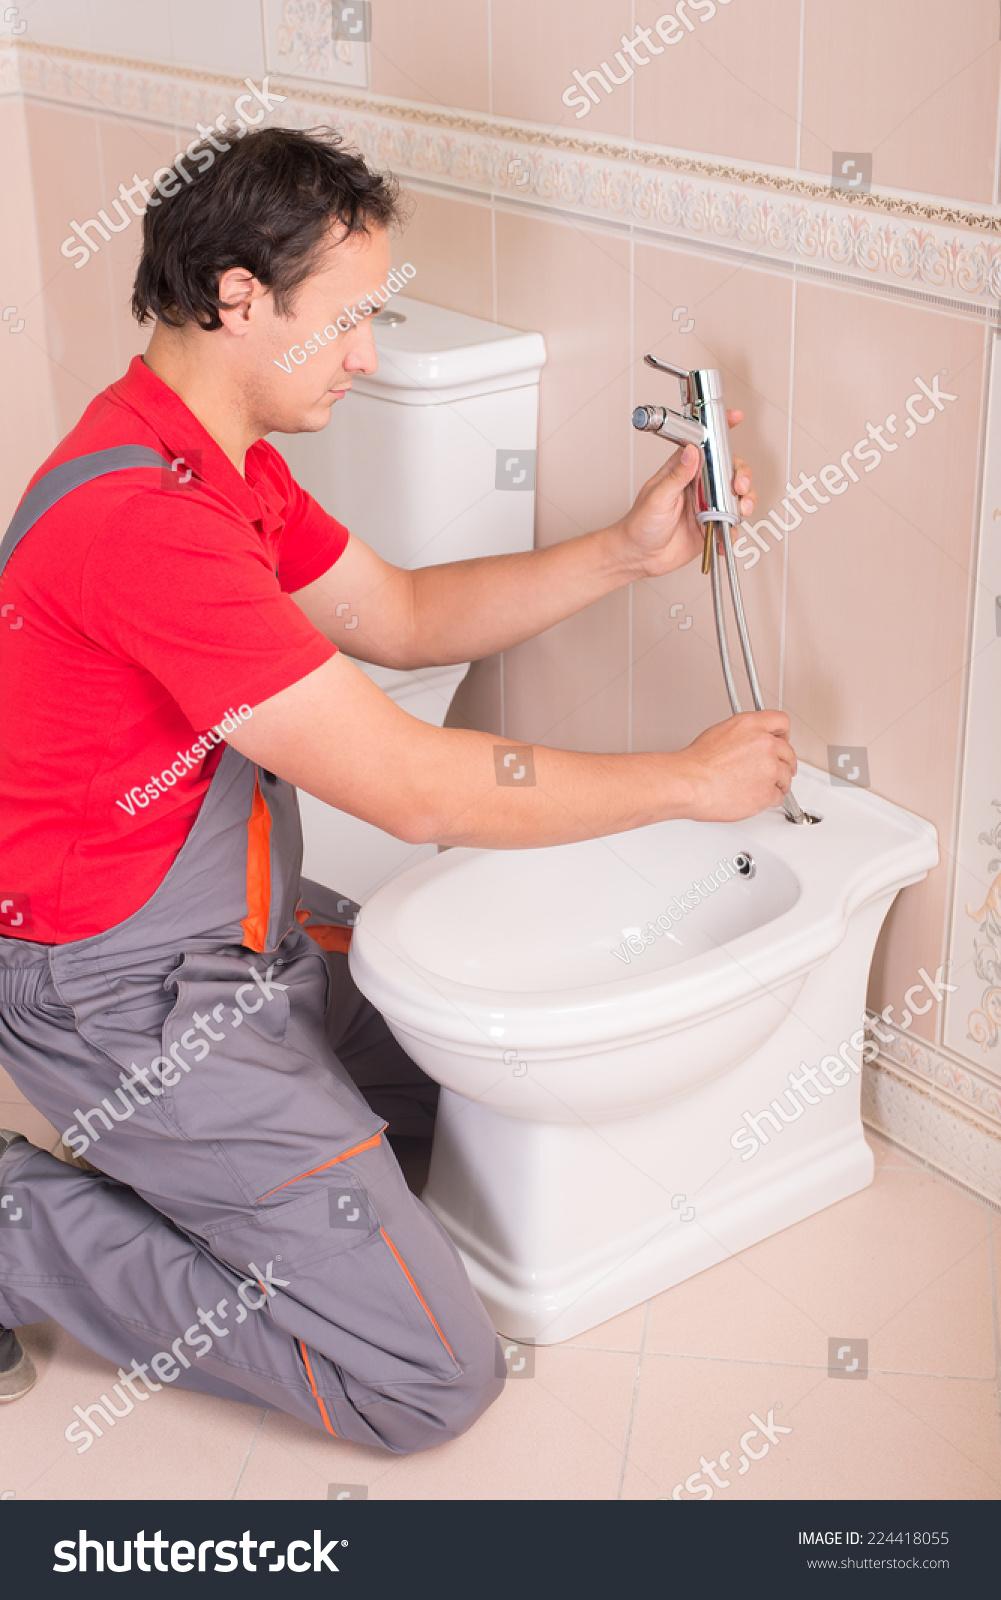 Plumber During His Work Toilet Stock Photo & Image (Royalty-Free ...